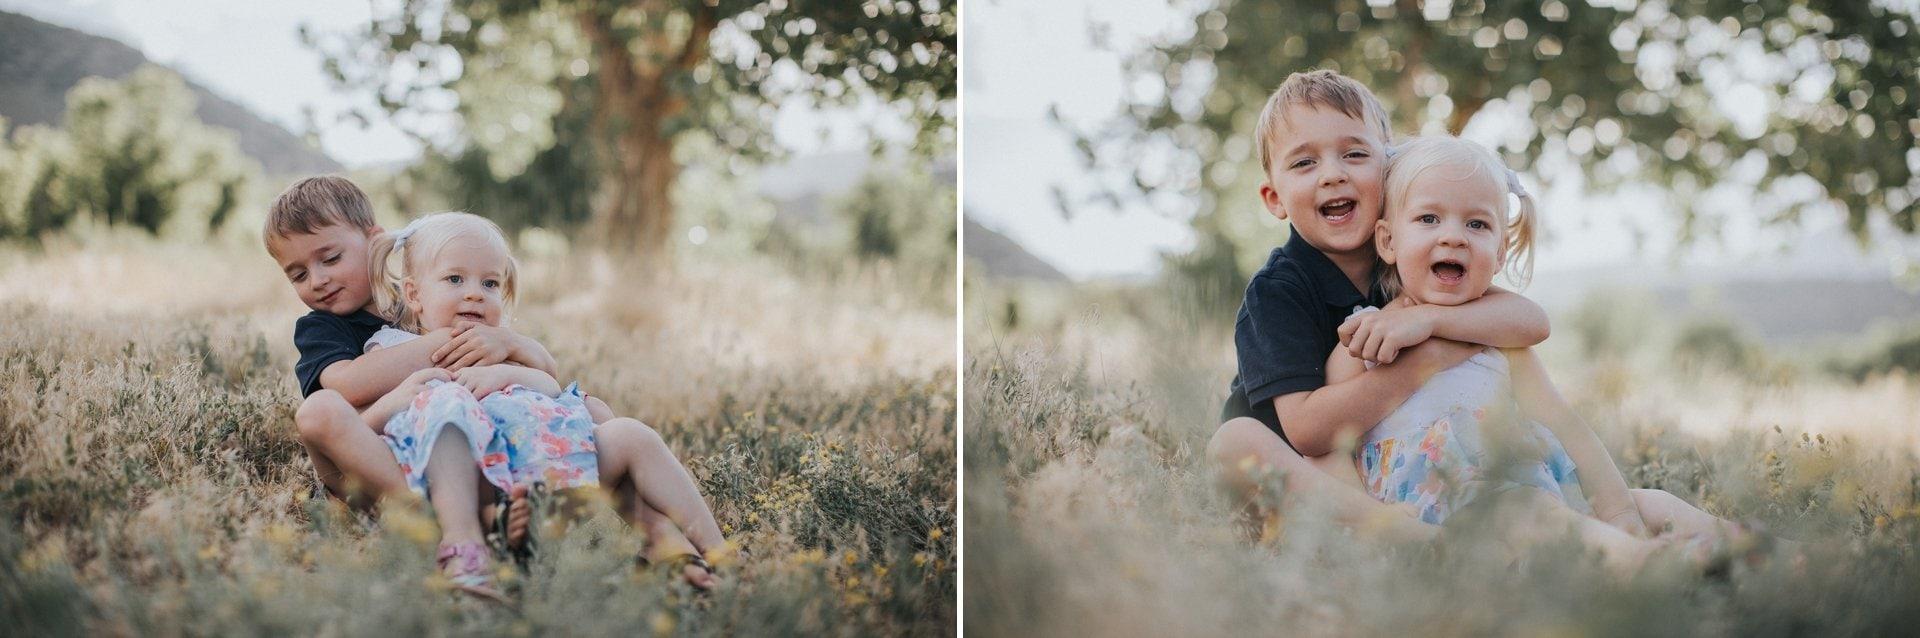 Denver Family Photographer, Colorado Family Photographer, Lifestyle session